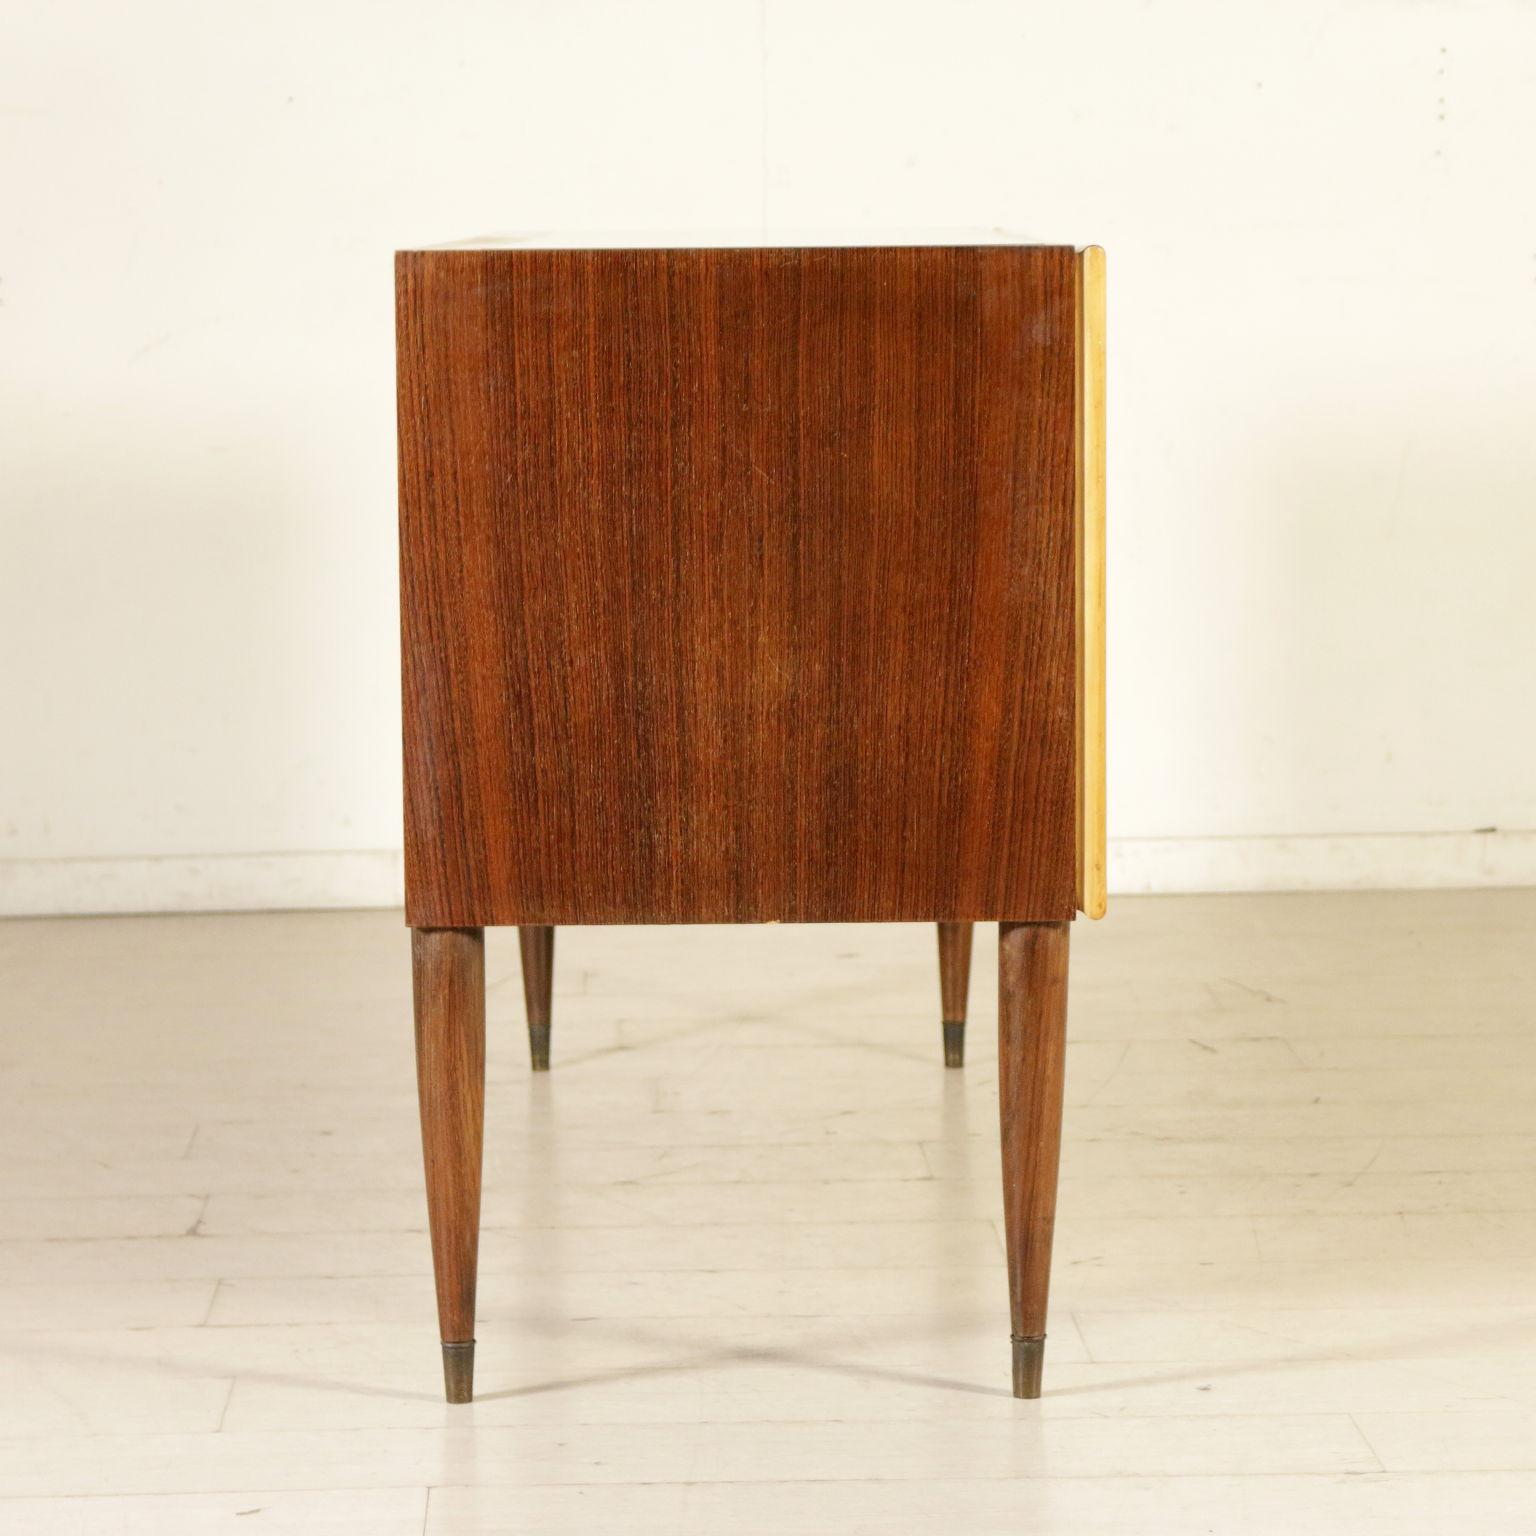 kommode 50er jahre - möbel - modernes design - dimanoinmano.it